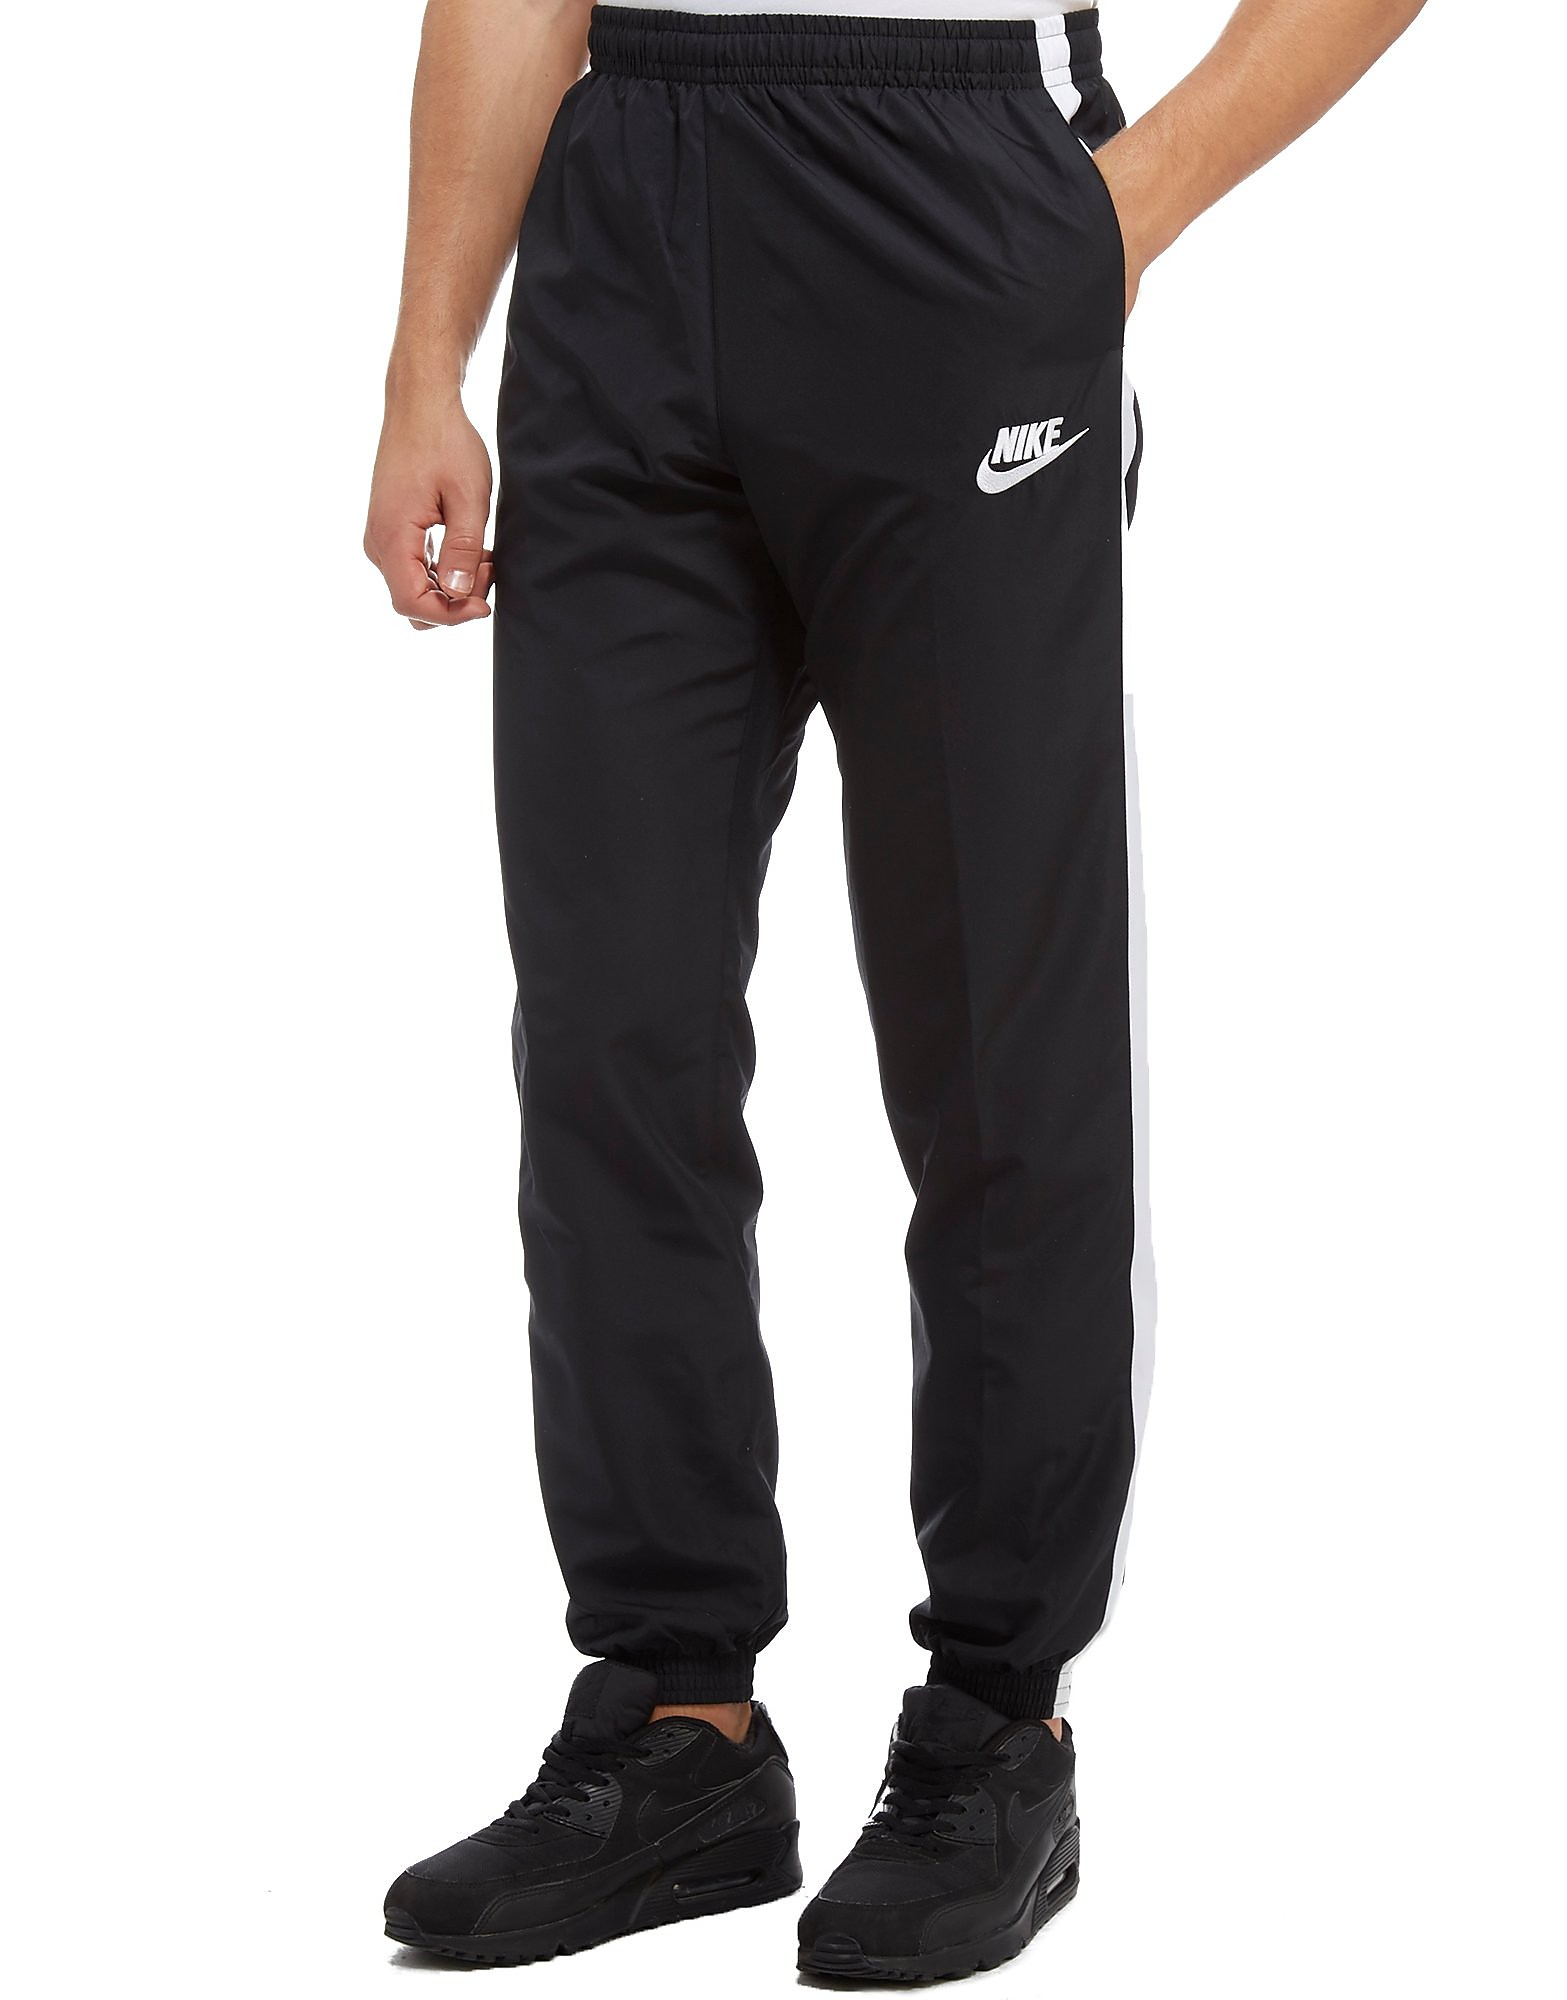 Nike Rocket Hosen